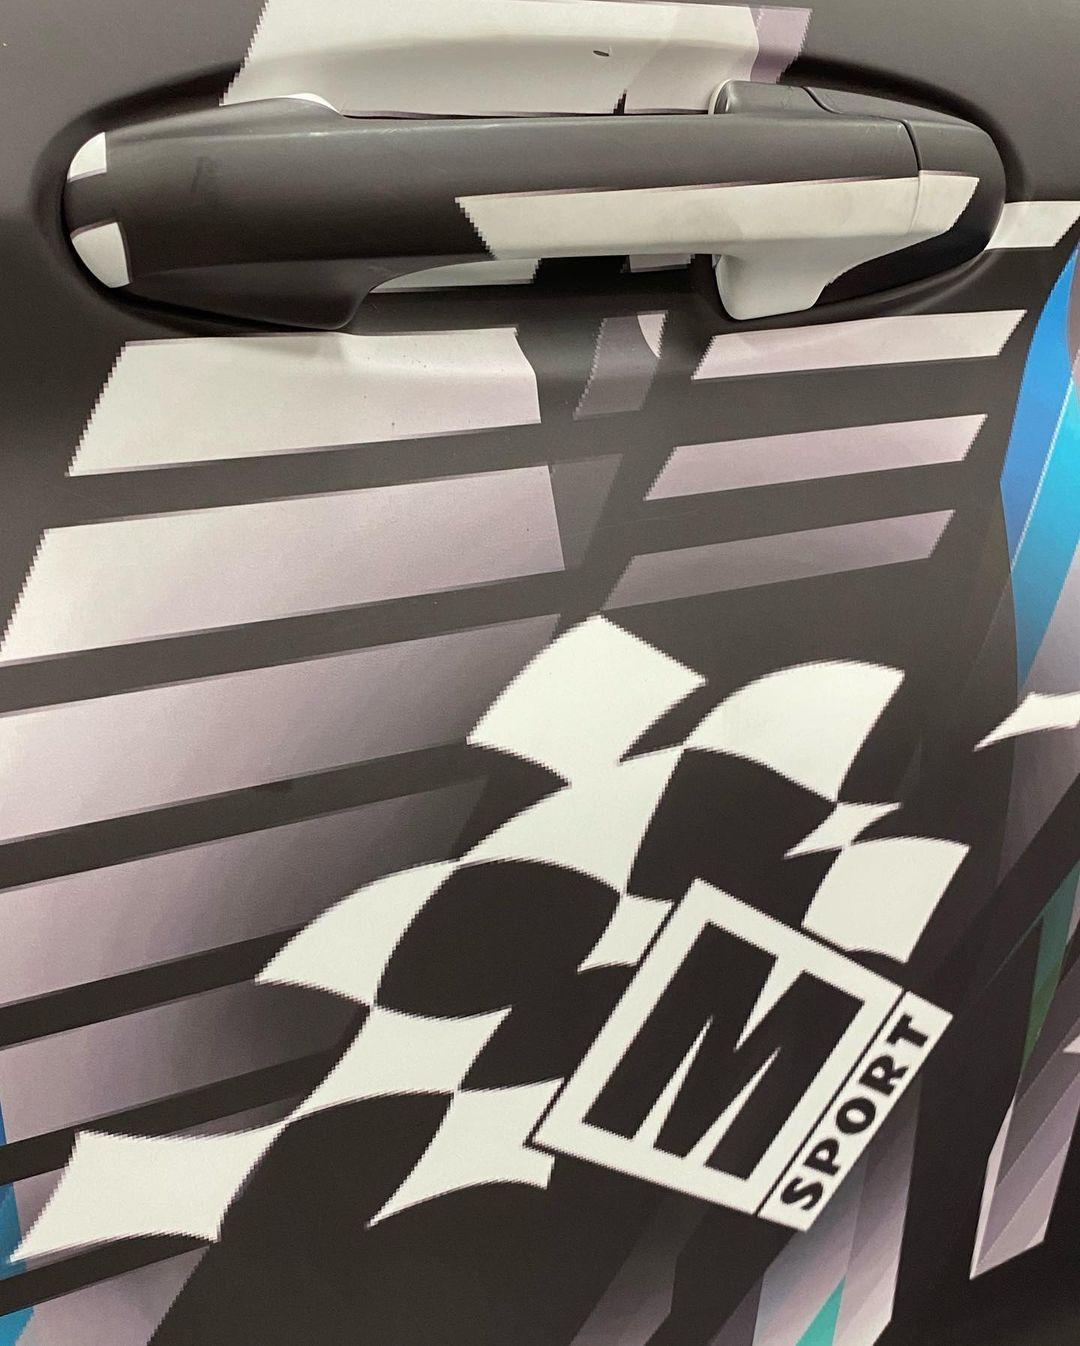 World Rally Championship: Temporada 2021  - Página 16 EwDXJy_XMBEp8GP?format=jpg&name=large